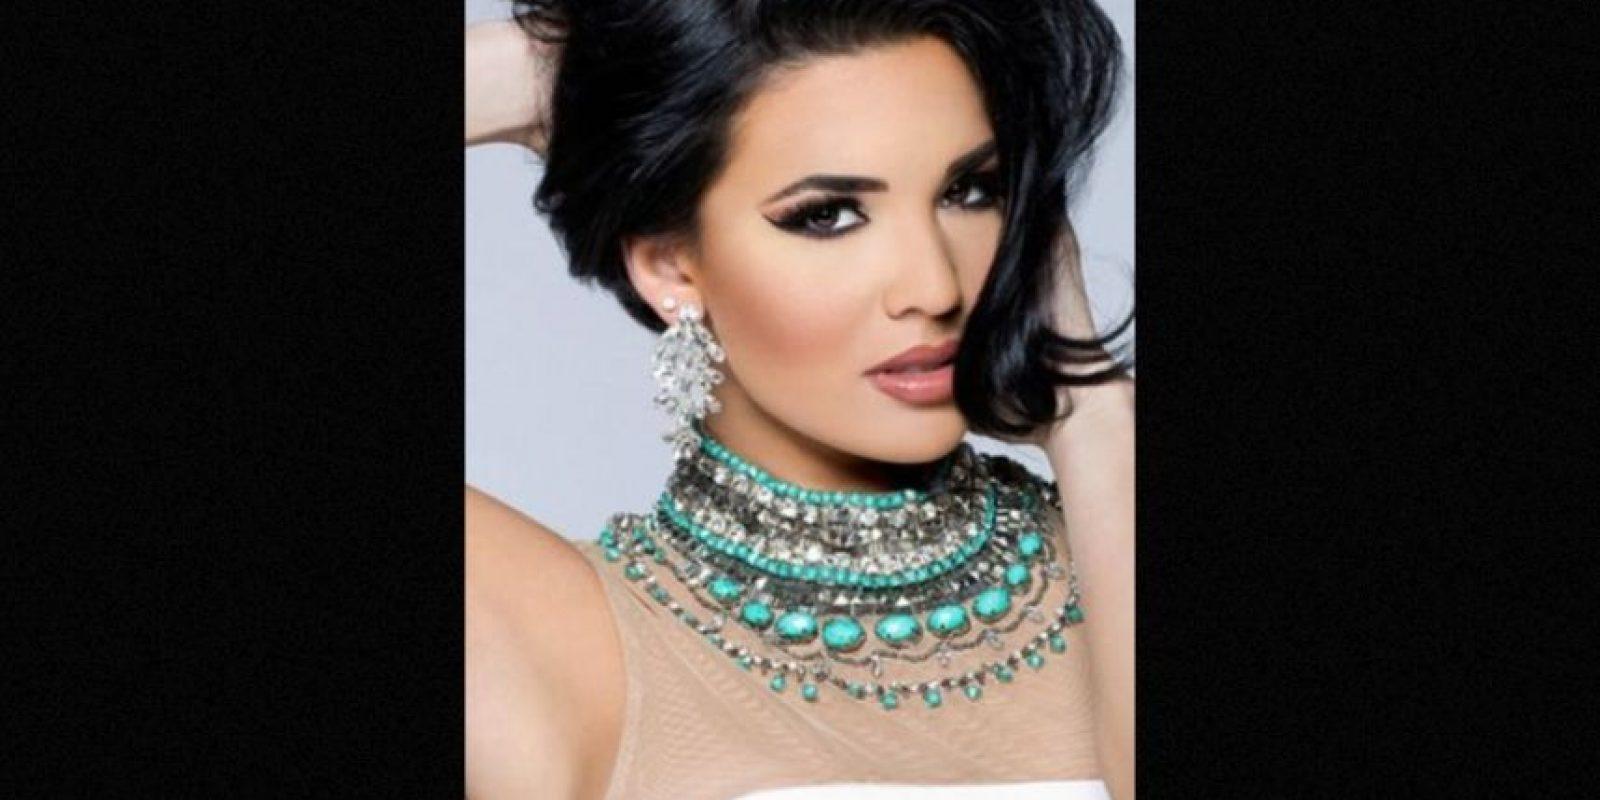 Ylianna Guerra- Miss Texas Foto:Vía missuniverse.com